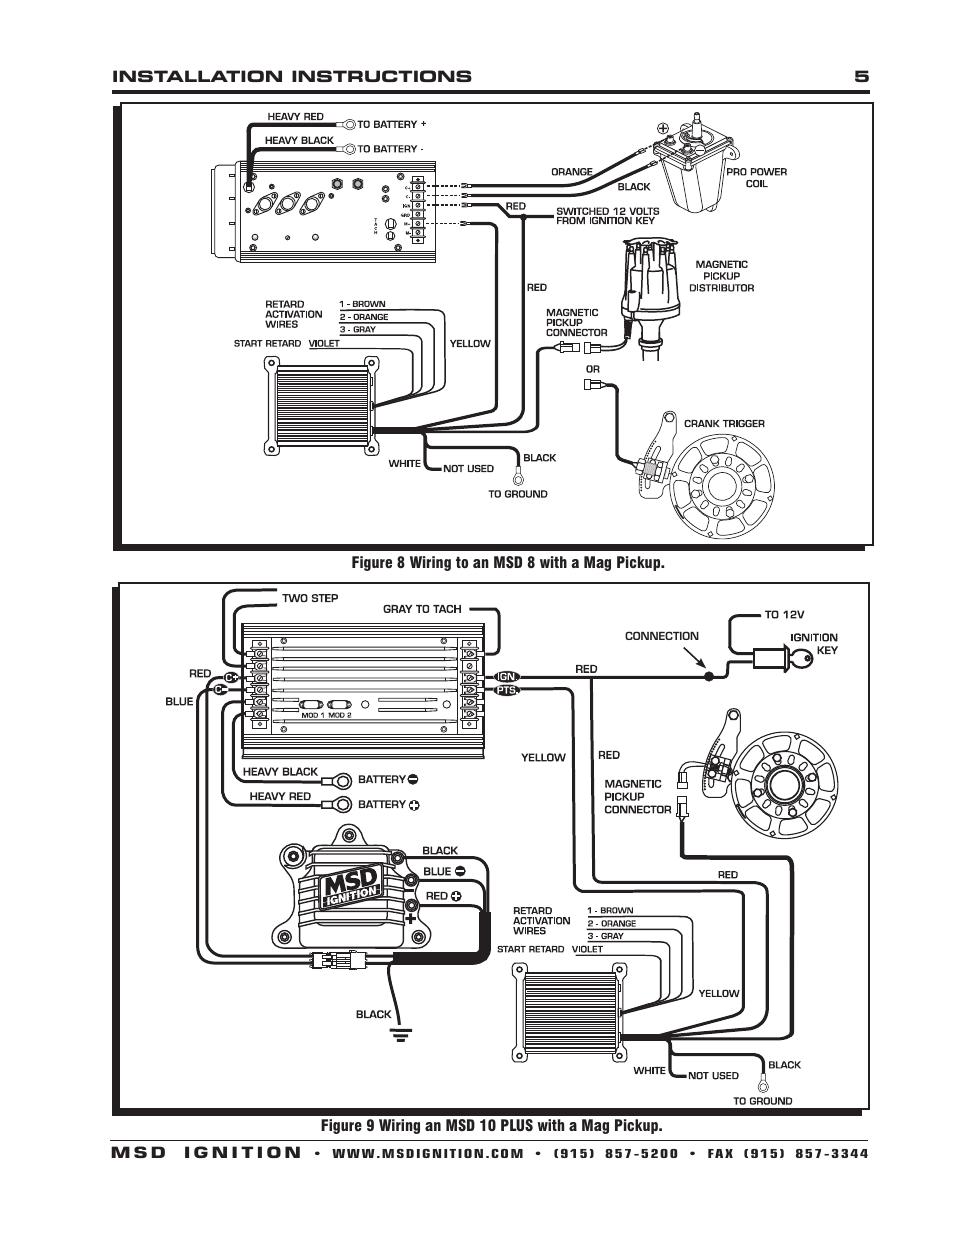 msd 8970 wiring diagram wiring diagram directory msd ls series wiring diagram msd ignition 8970 3 stage retard